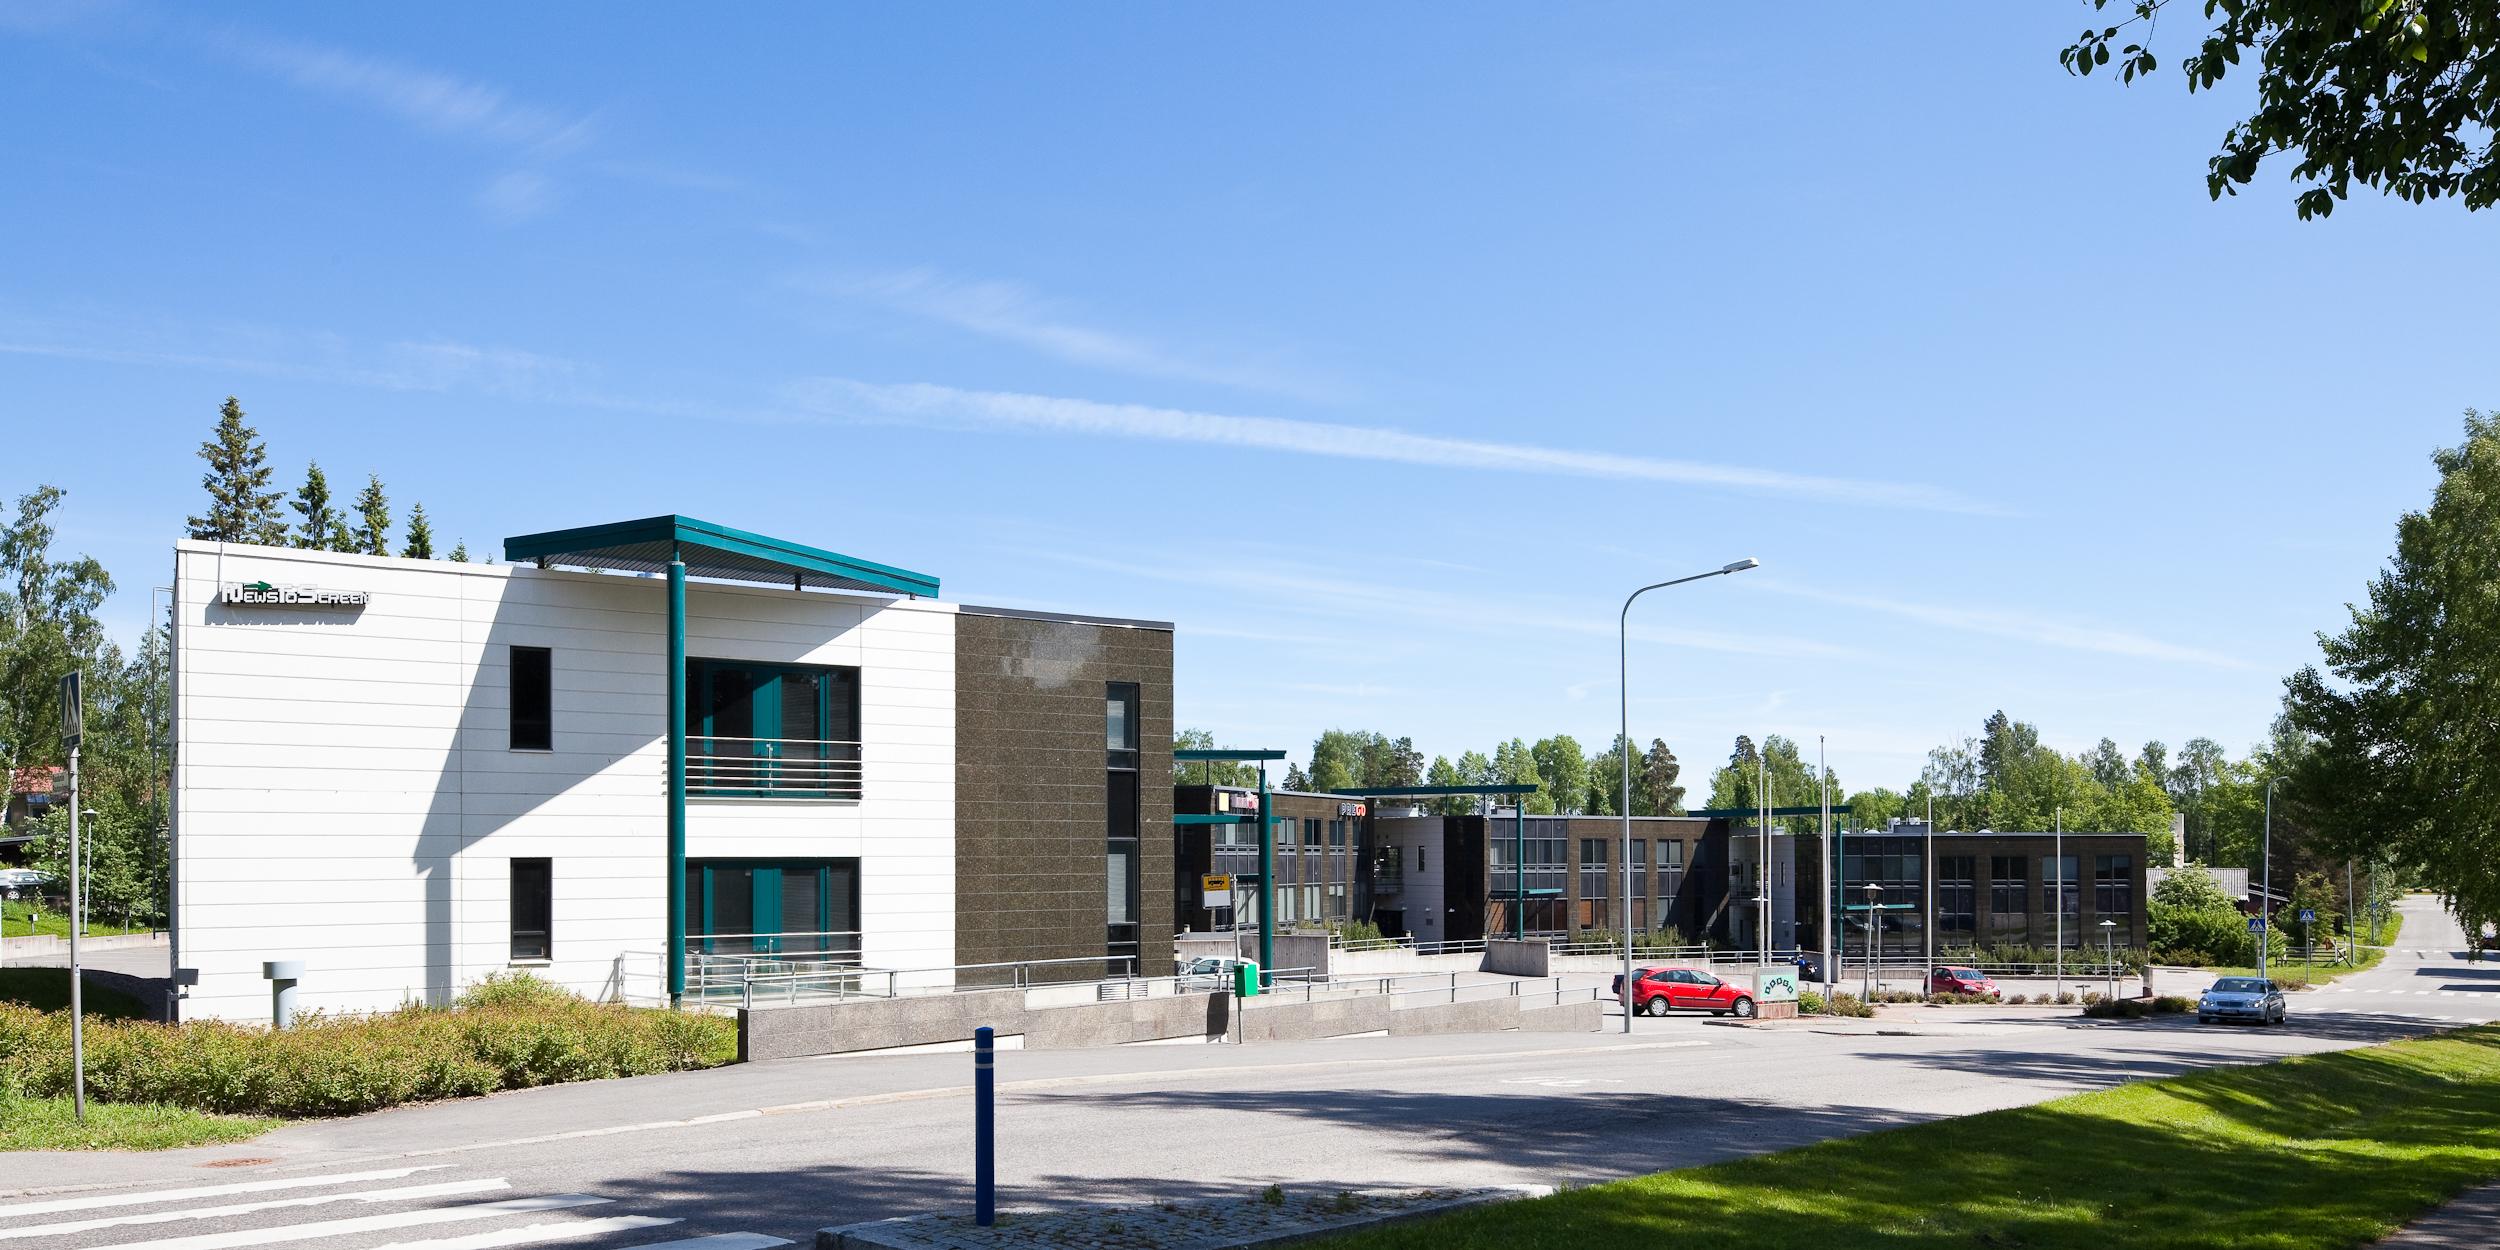 Valkjärventie 7, Pohjois-Tapiola, Espoo